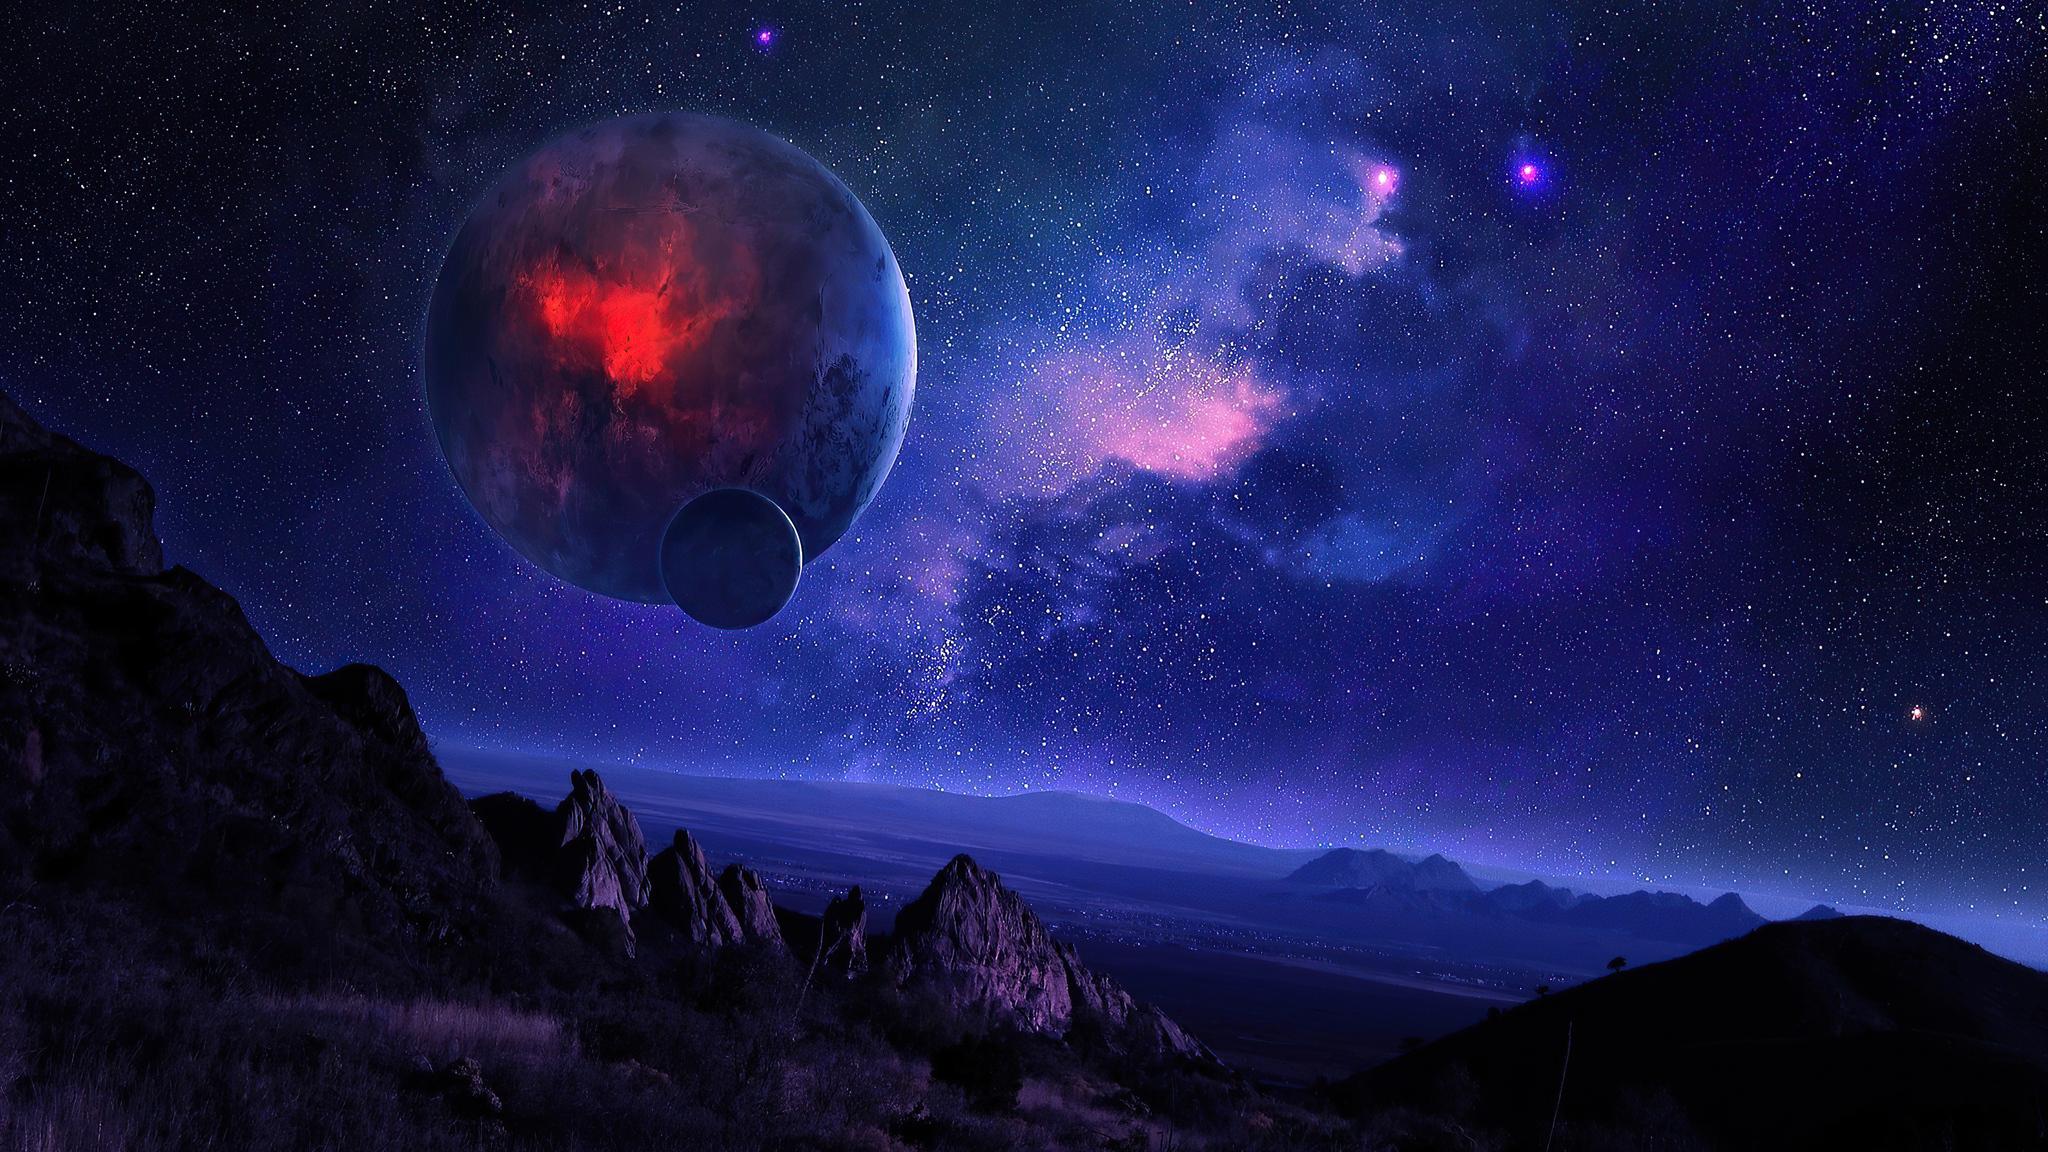 space-art-planet-4k-59.jpg